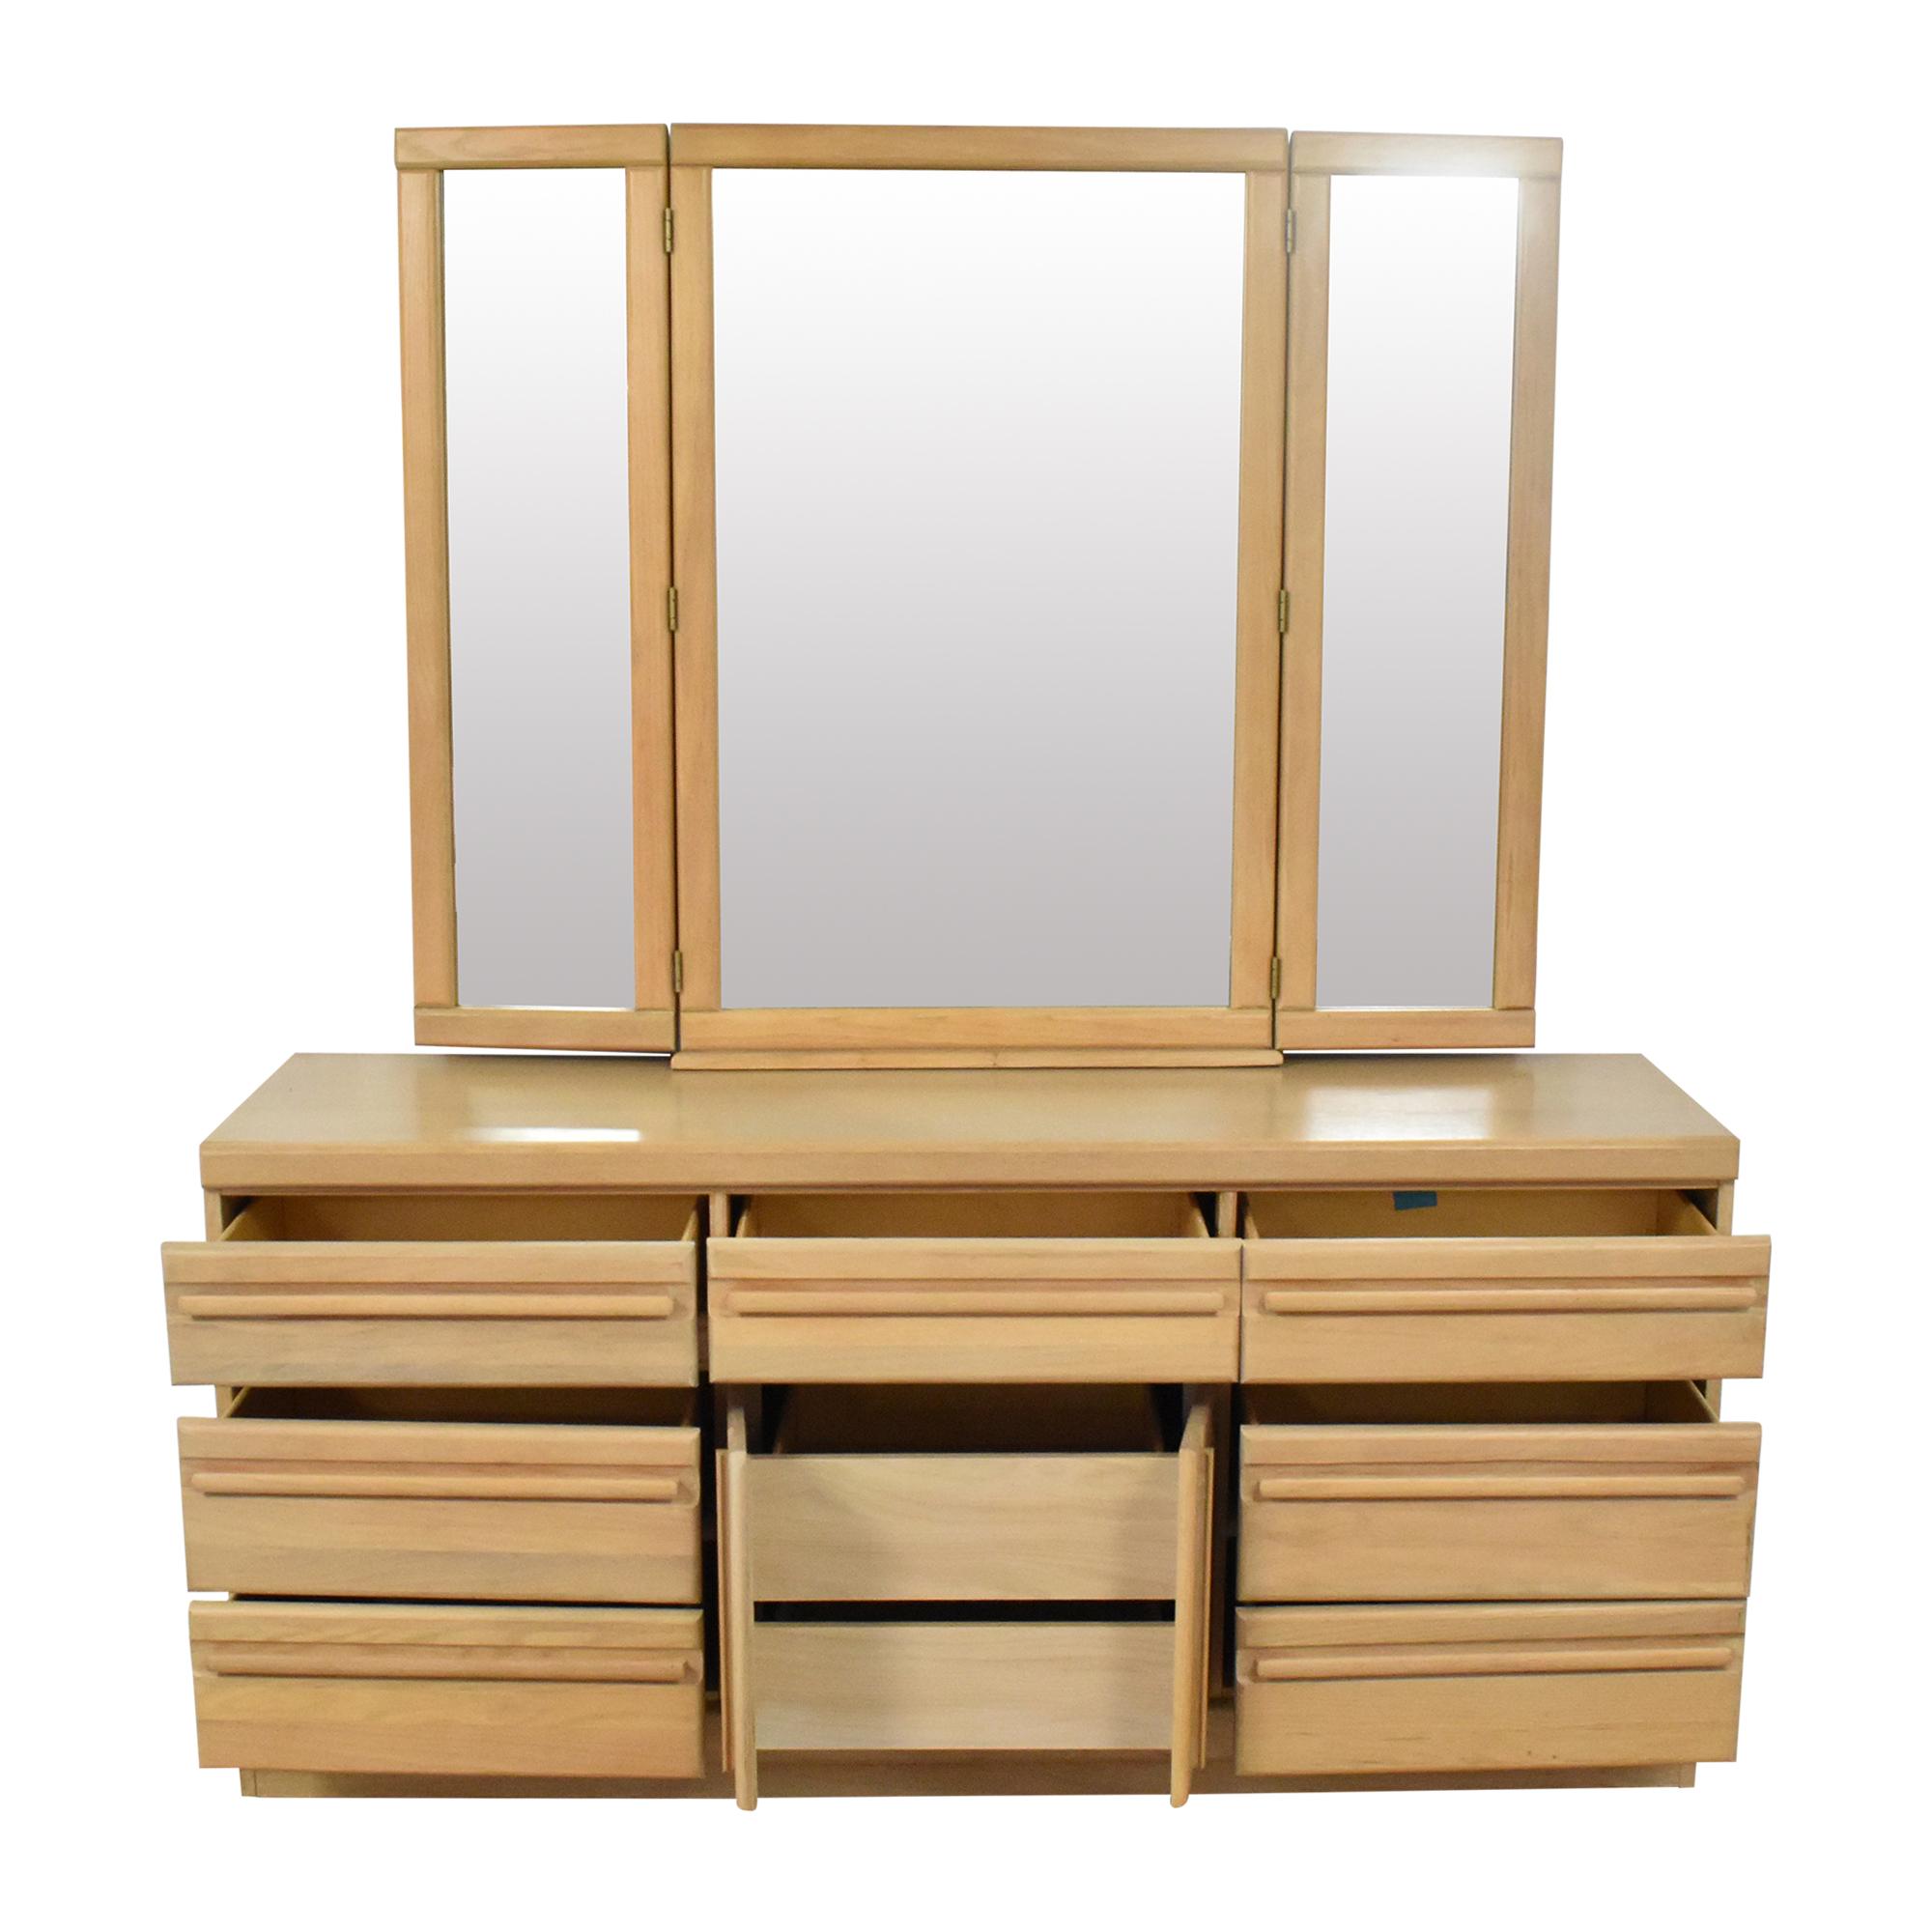 Broyhill Furniture Broyhill Triple Dresser with Mirror on sale